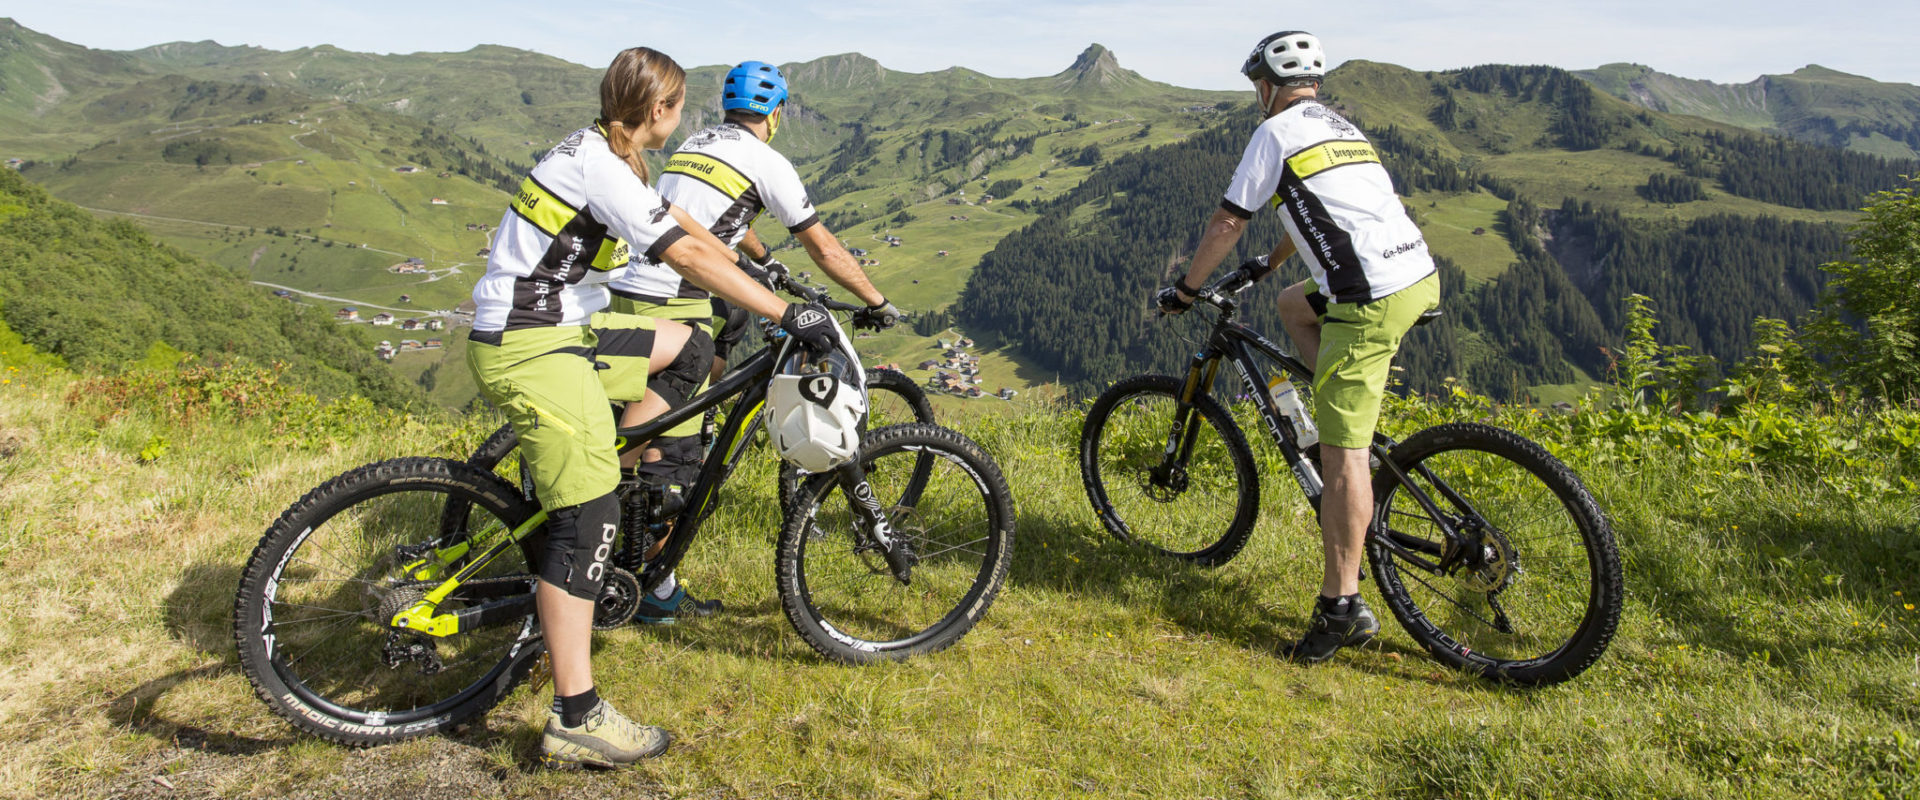 Mountainbike © Stephan Schatz / Bike-Schule Au-Schoppernau